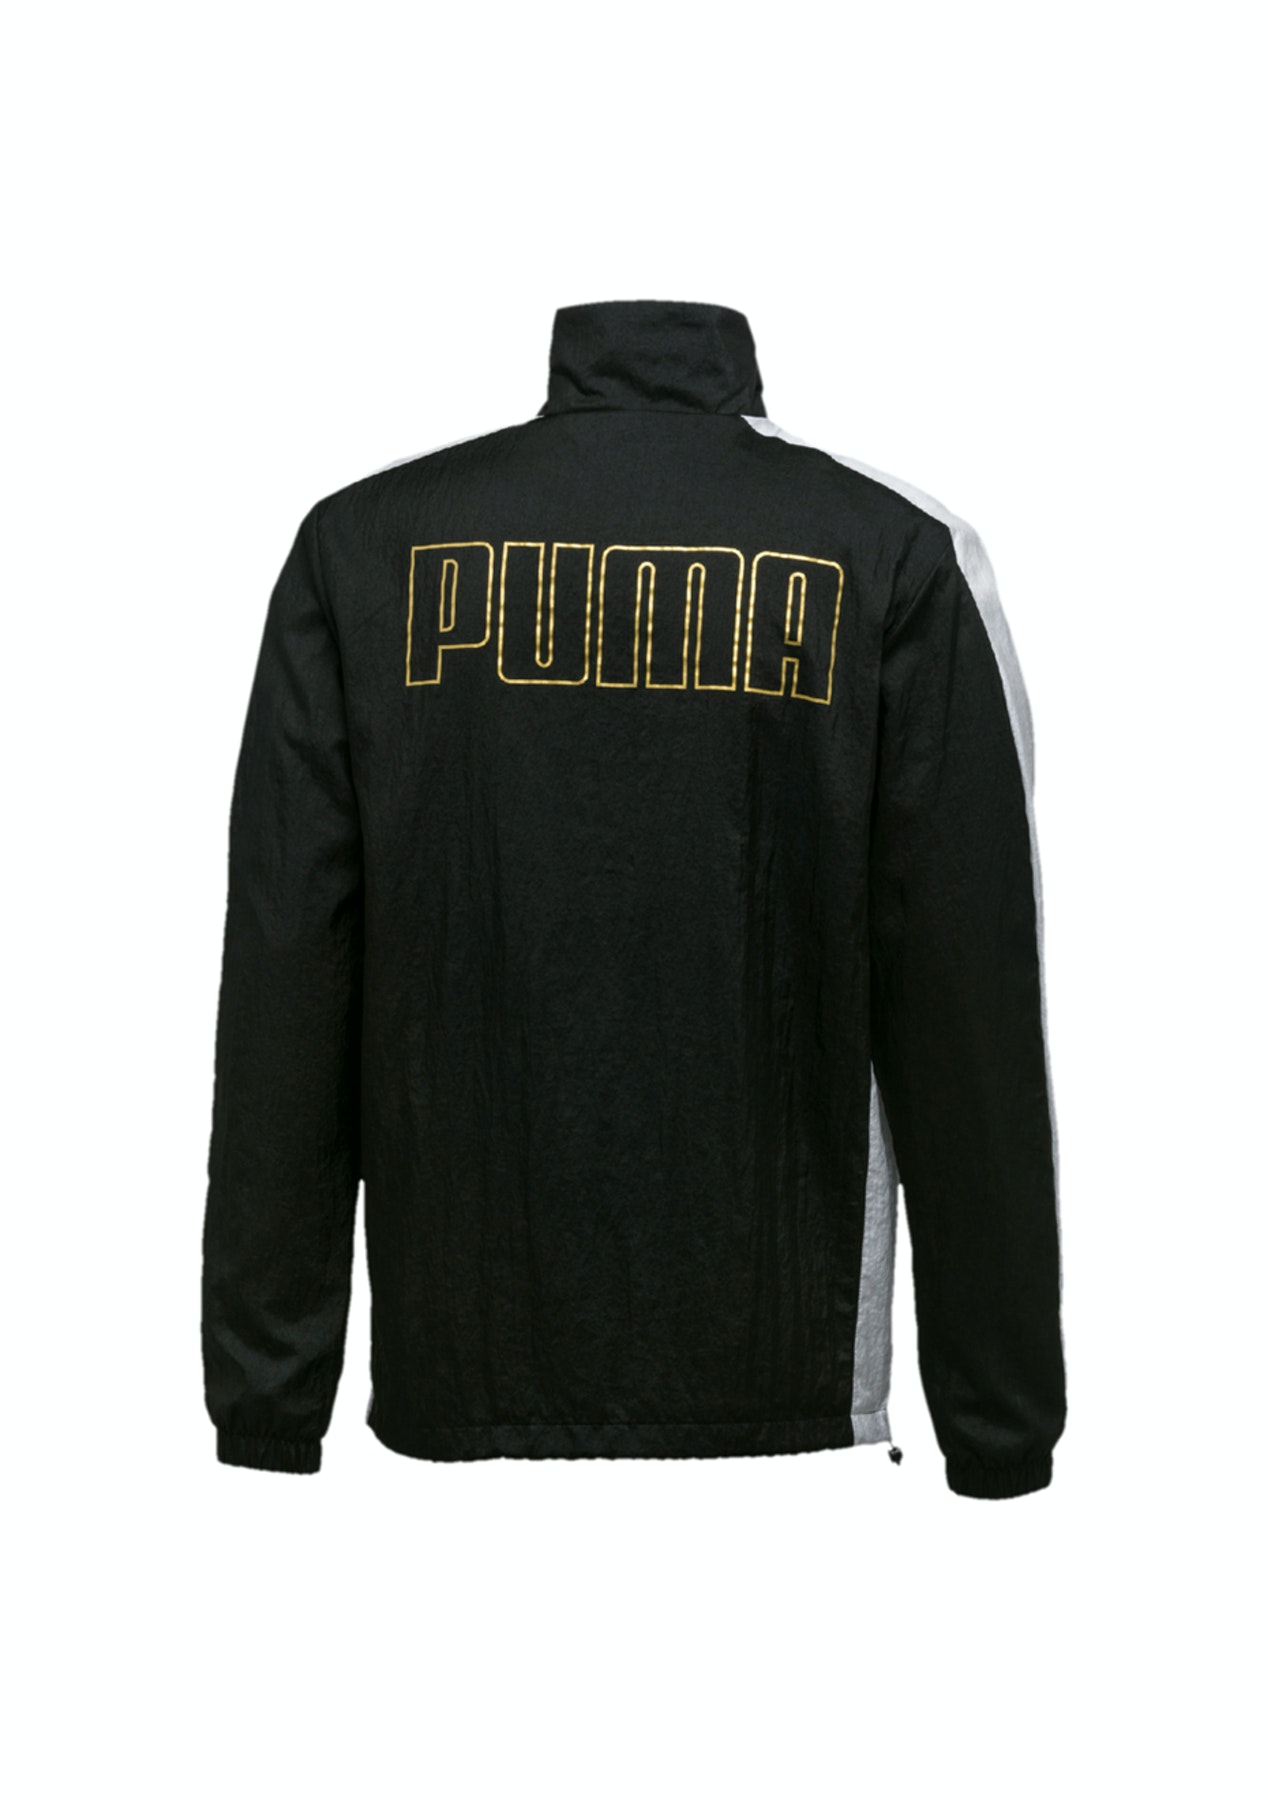 38a87c60a1f4 Puma - Men s T7 Bboy Track Jacket - Black White - Big Brand Mens Outlet -  Onceit